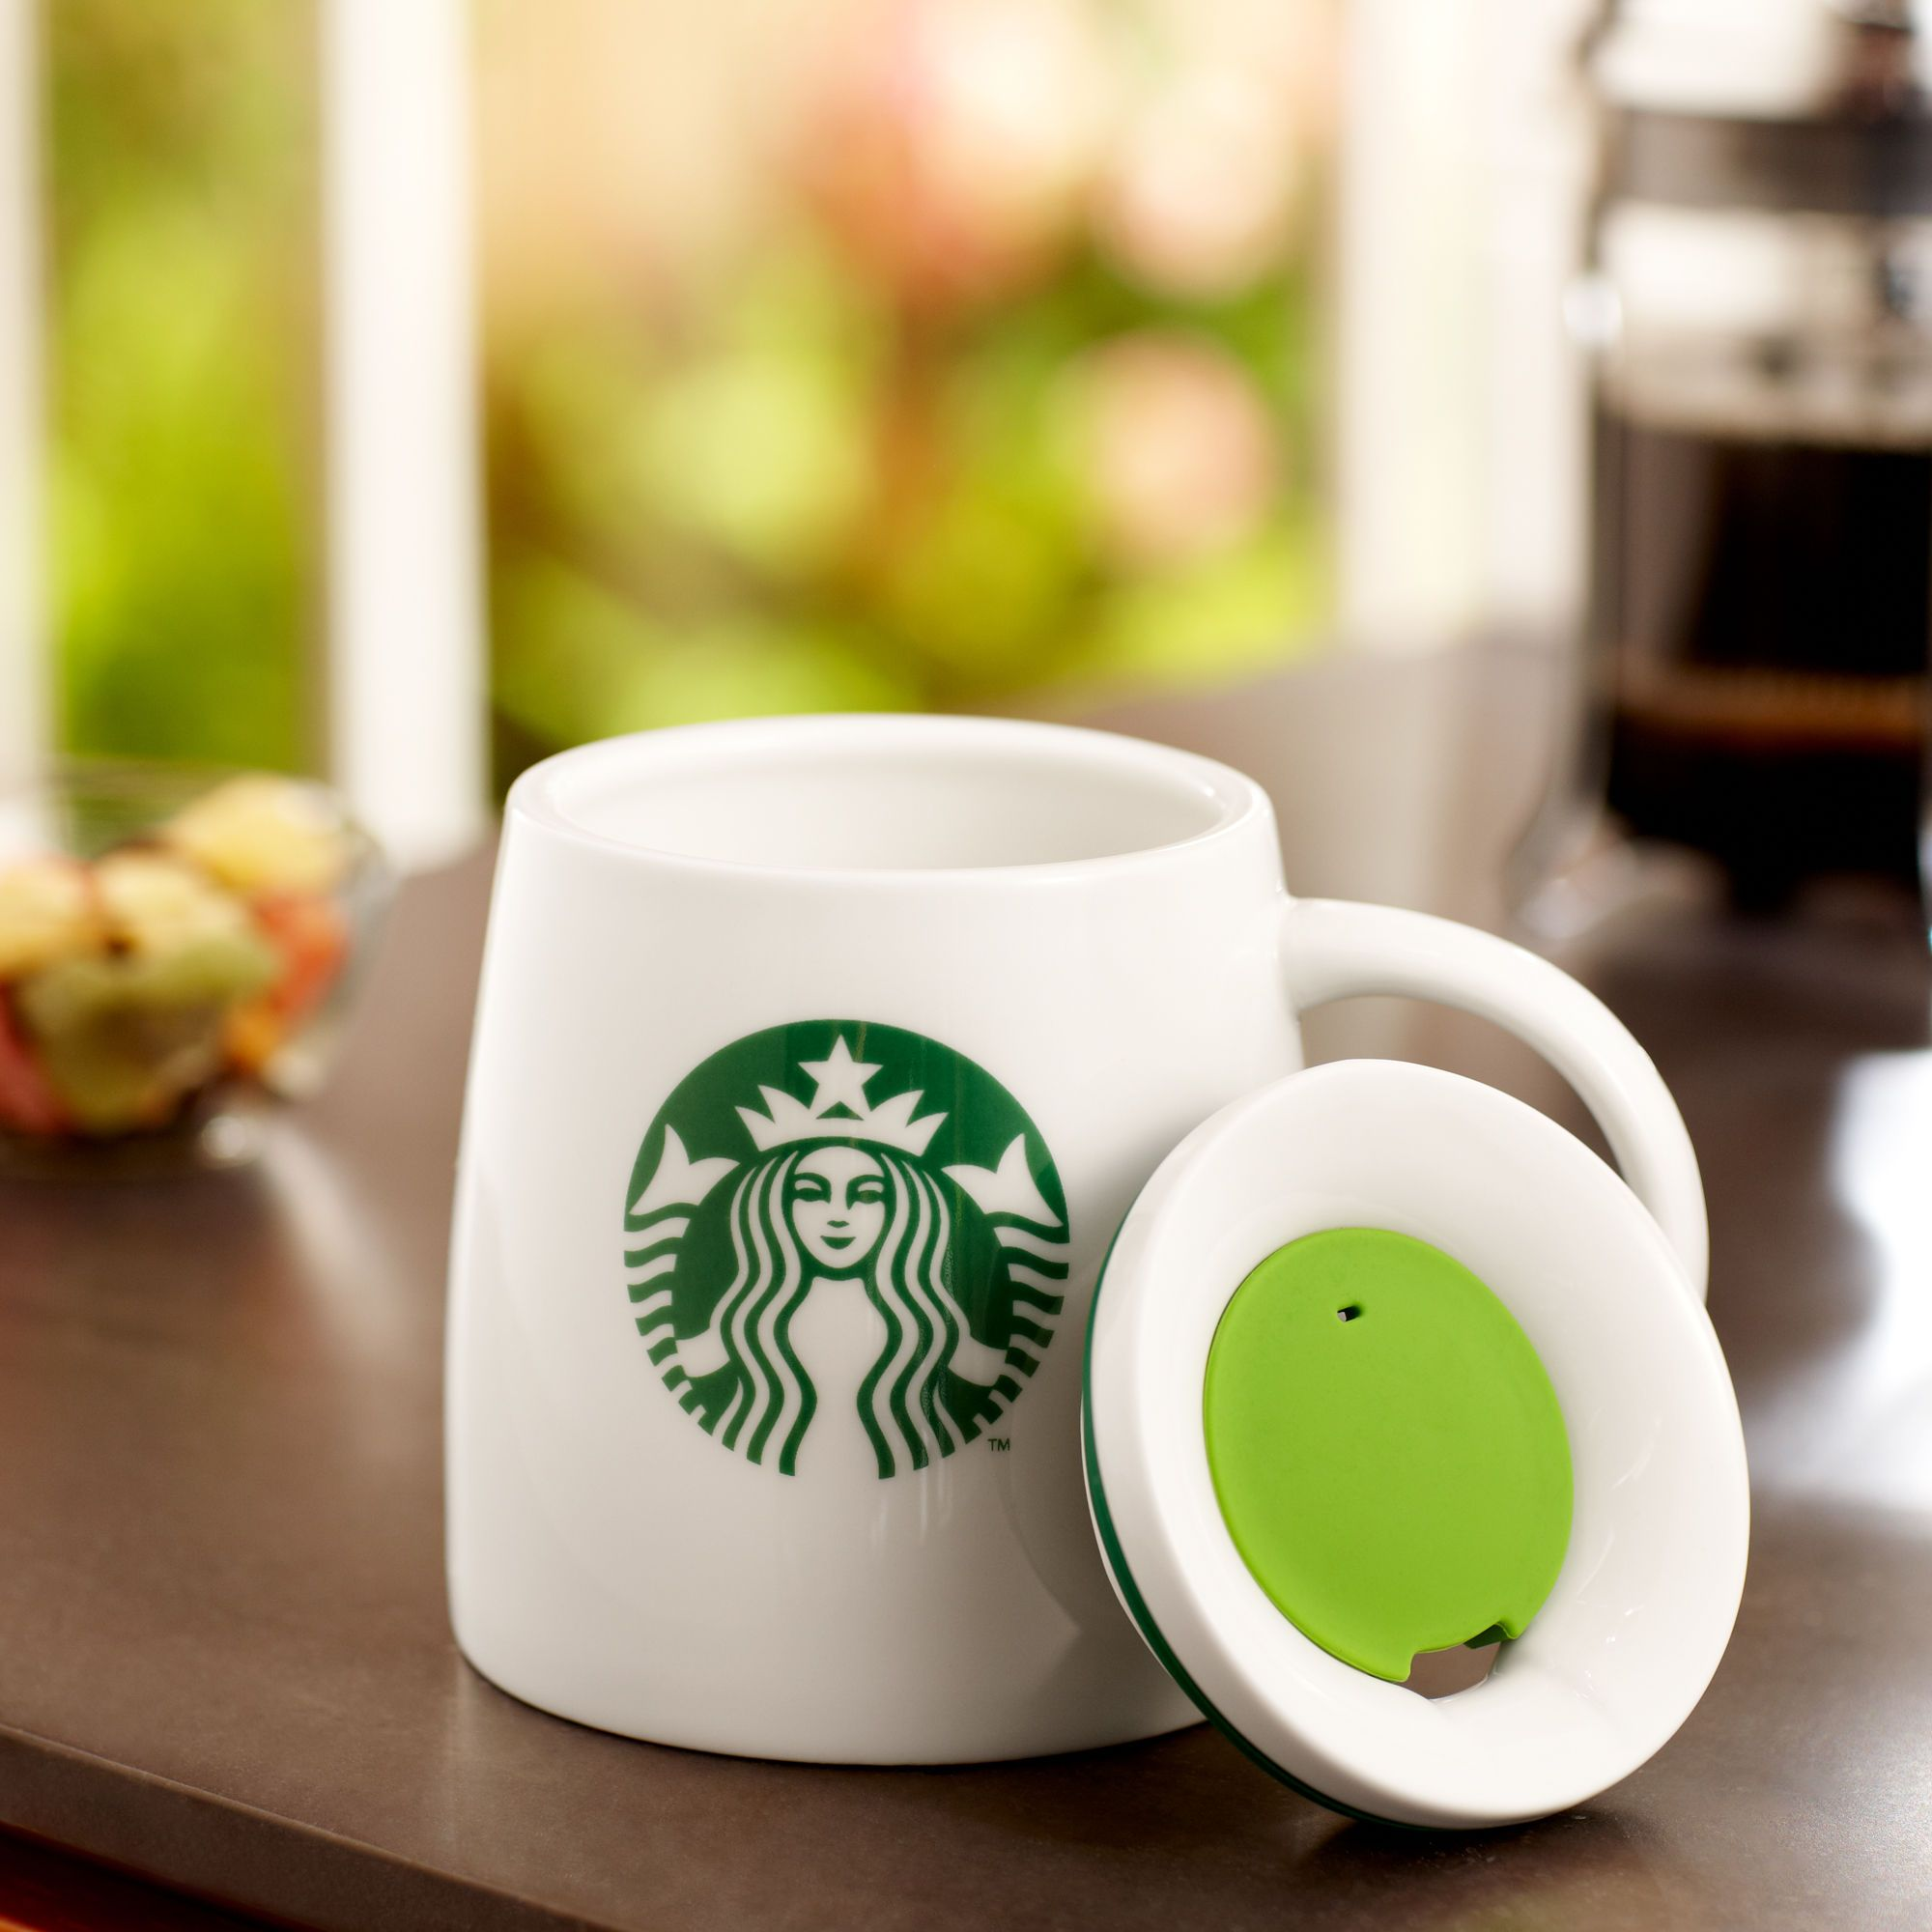 Starbucks® Ceramic Mug with Lid, 14 fl oz, for Michele